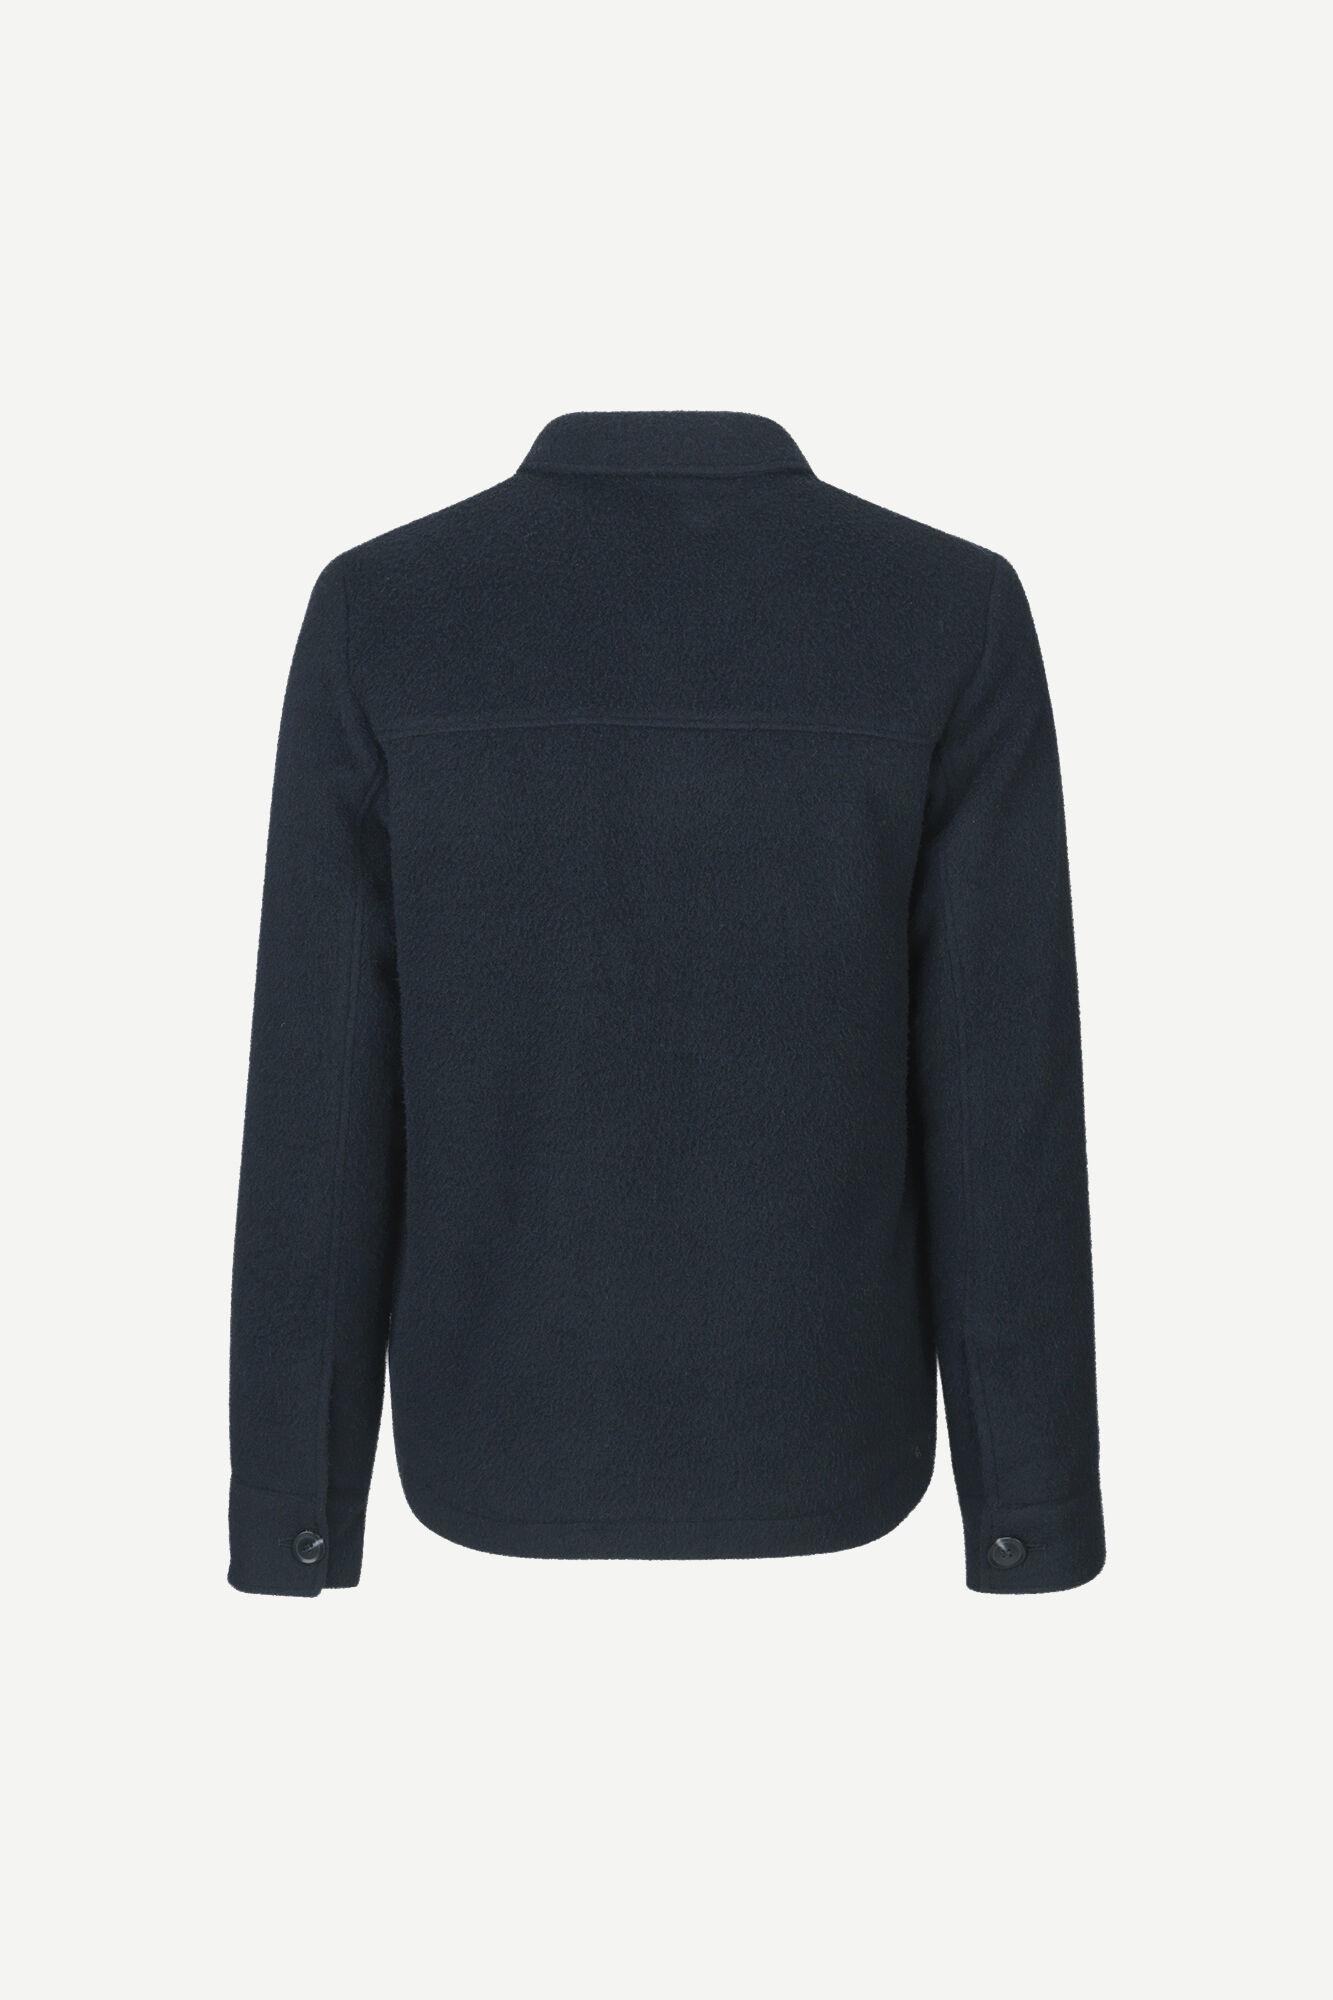 Melito Wool Jacket Night Sky Blue-2